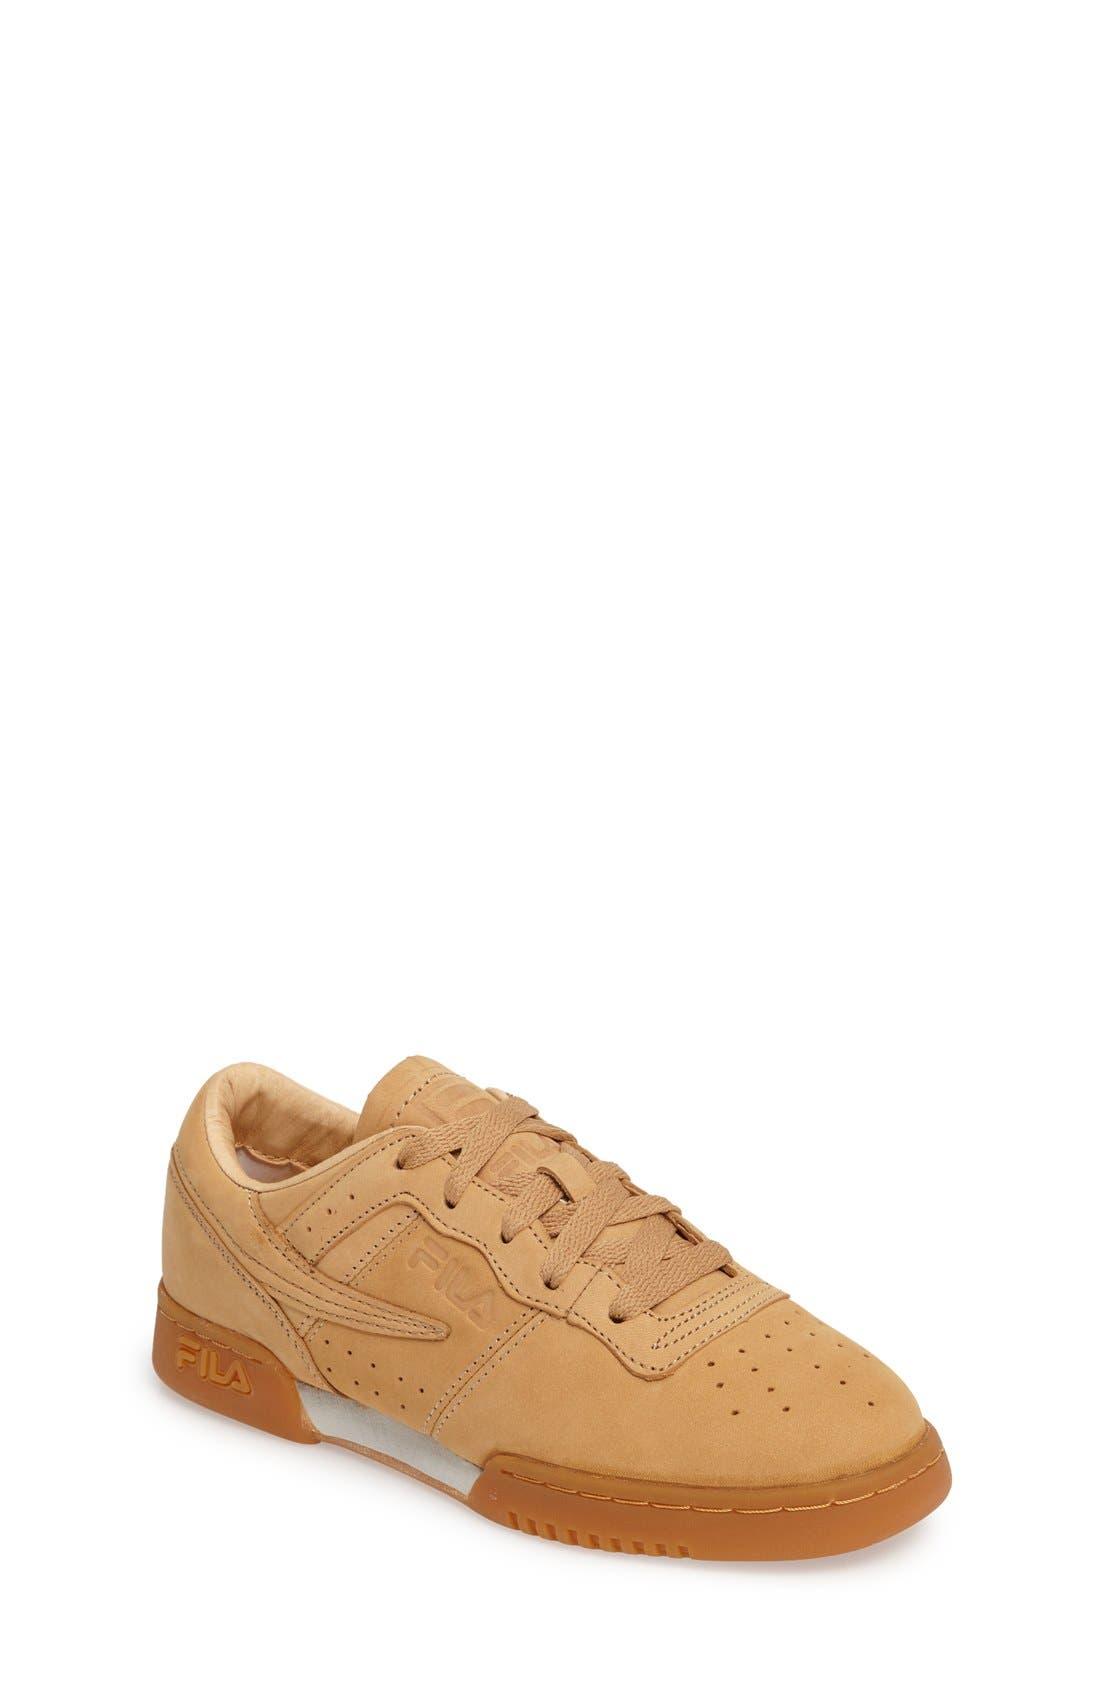 USA Heritage Sneaker,                         Main,                         color, Tan Nubuck Leather